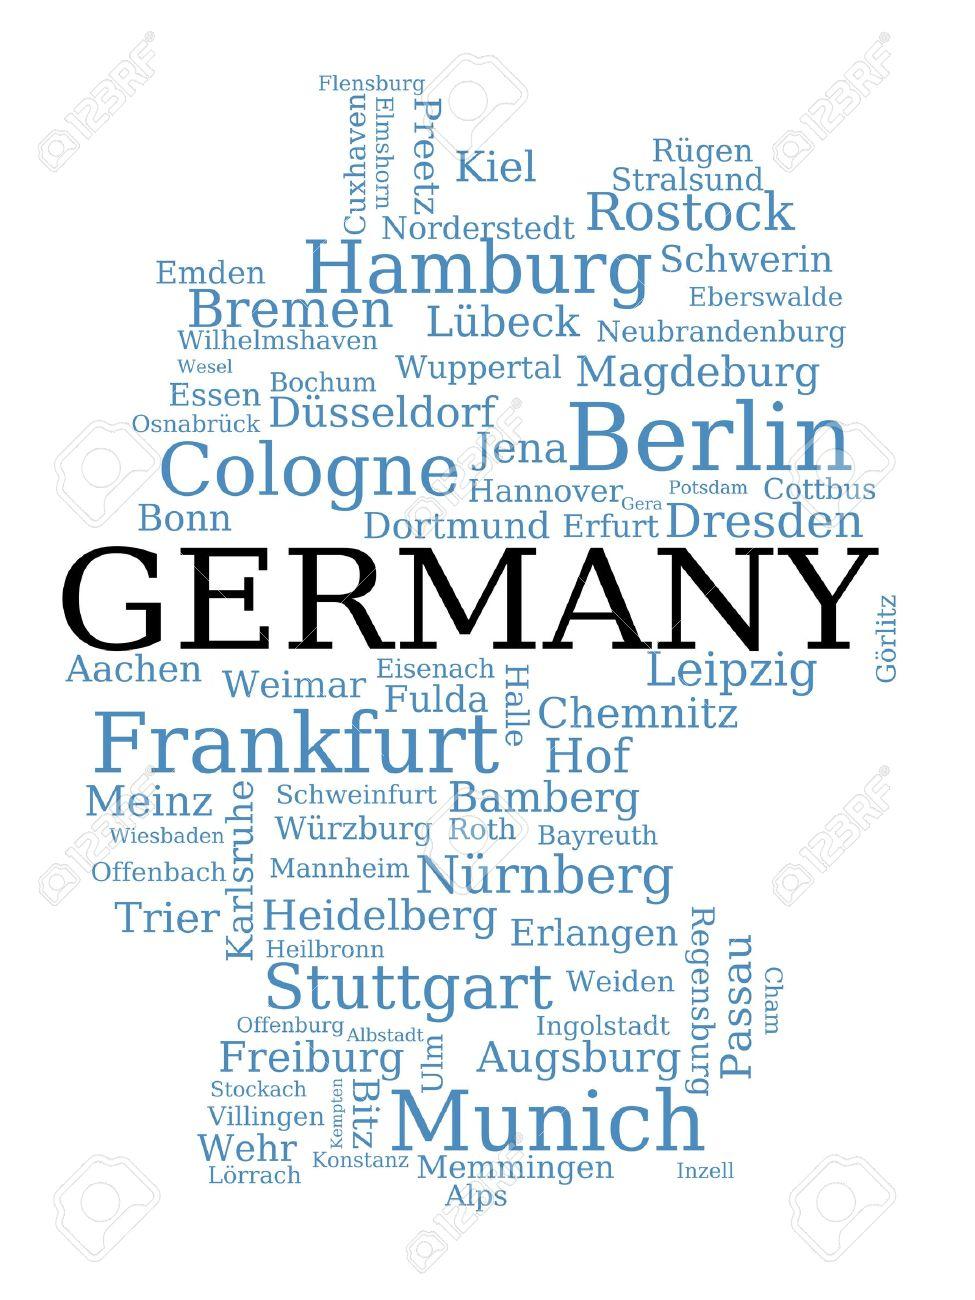 Cartina Muta Germania Con Fiumi.Vettoriale Germania Cartina Muta Fatta Di Nomi Di Citta Concetto Tedesco Image 10169610